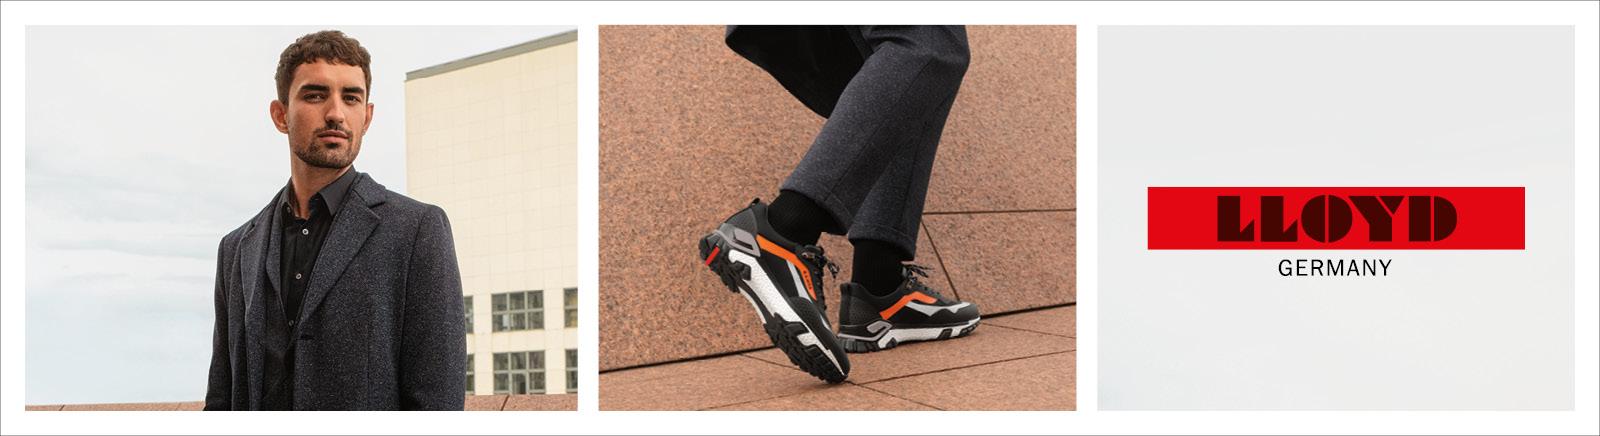 Gisy: LLOYD Business Schuhe für Herren online shoppen